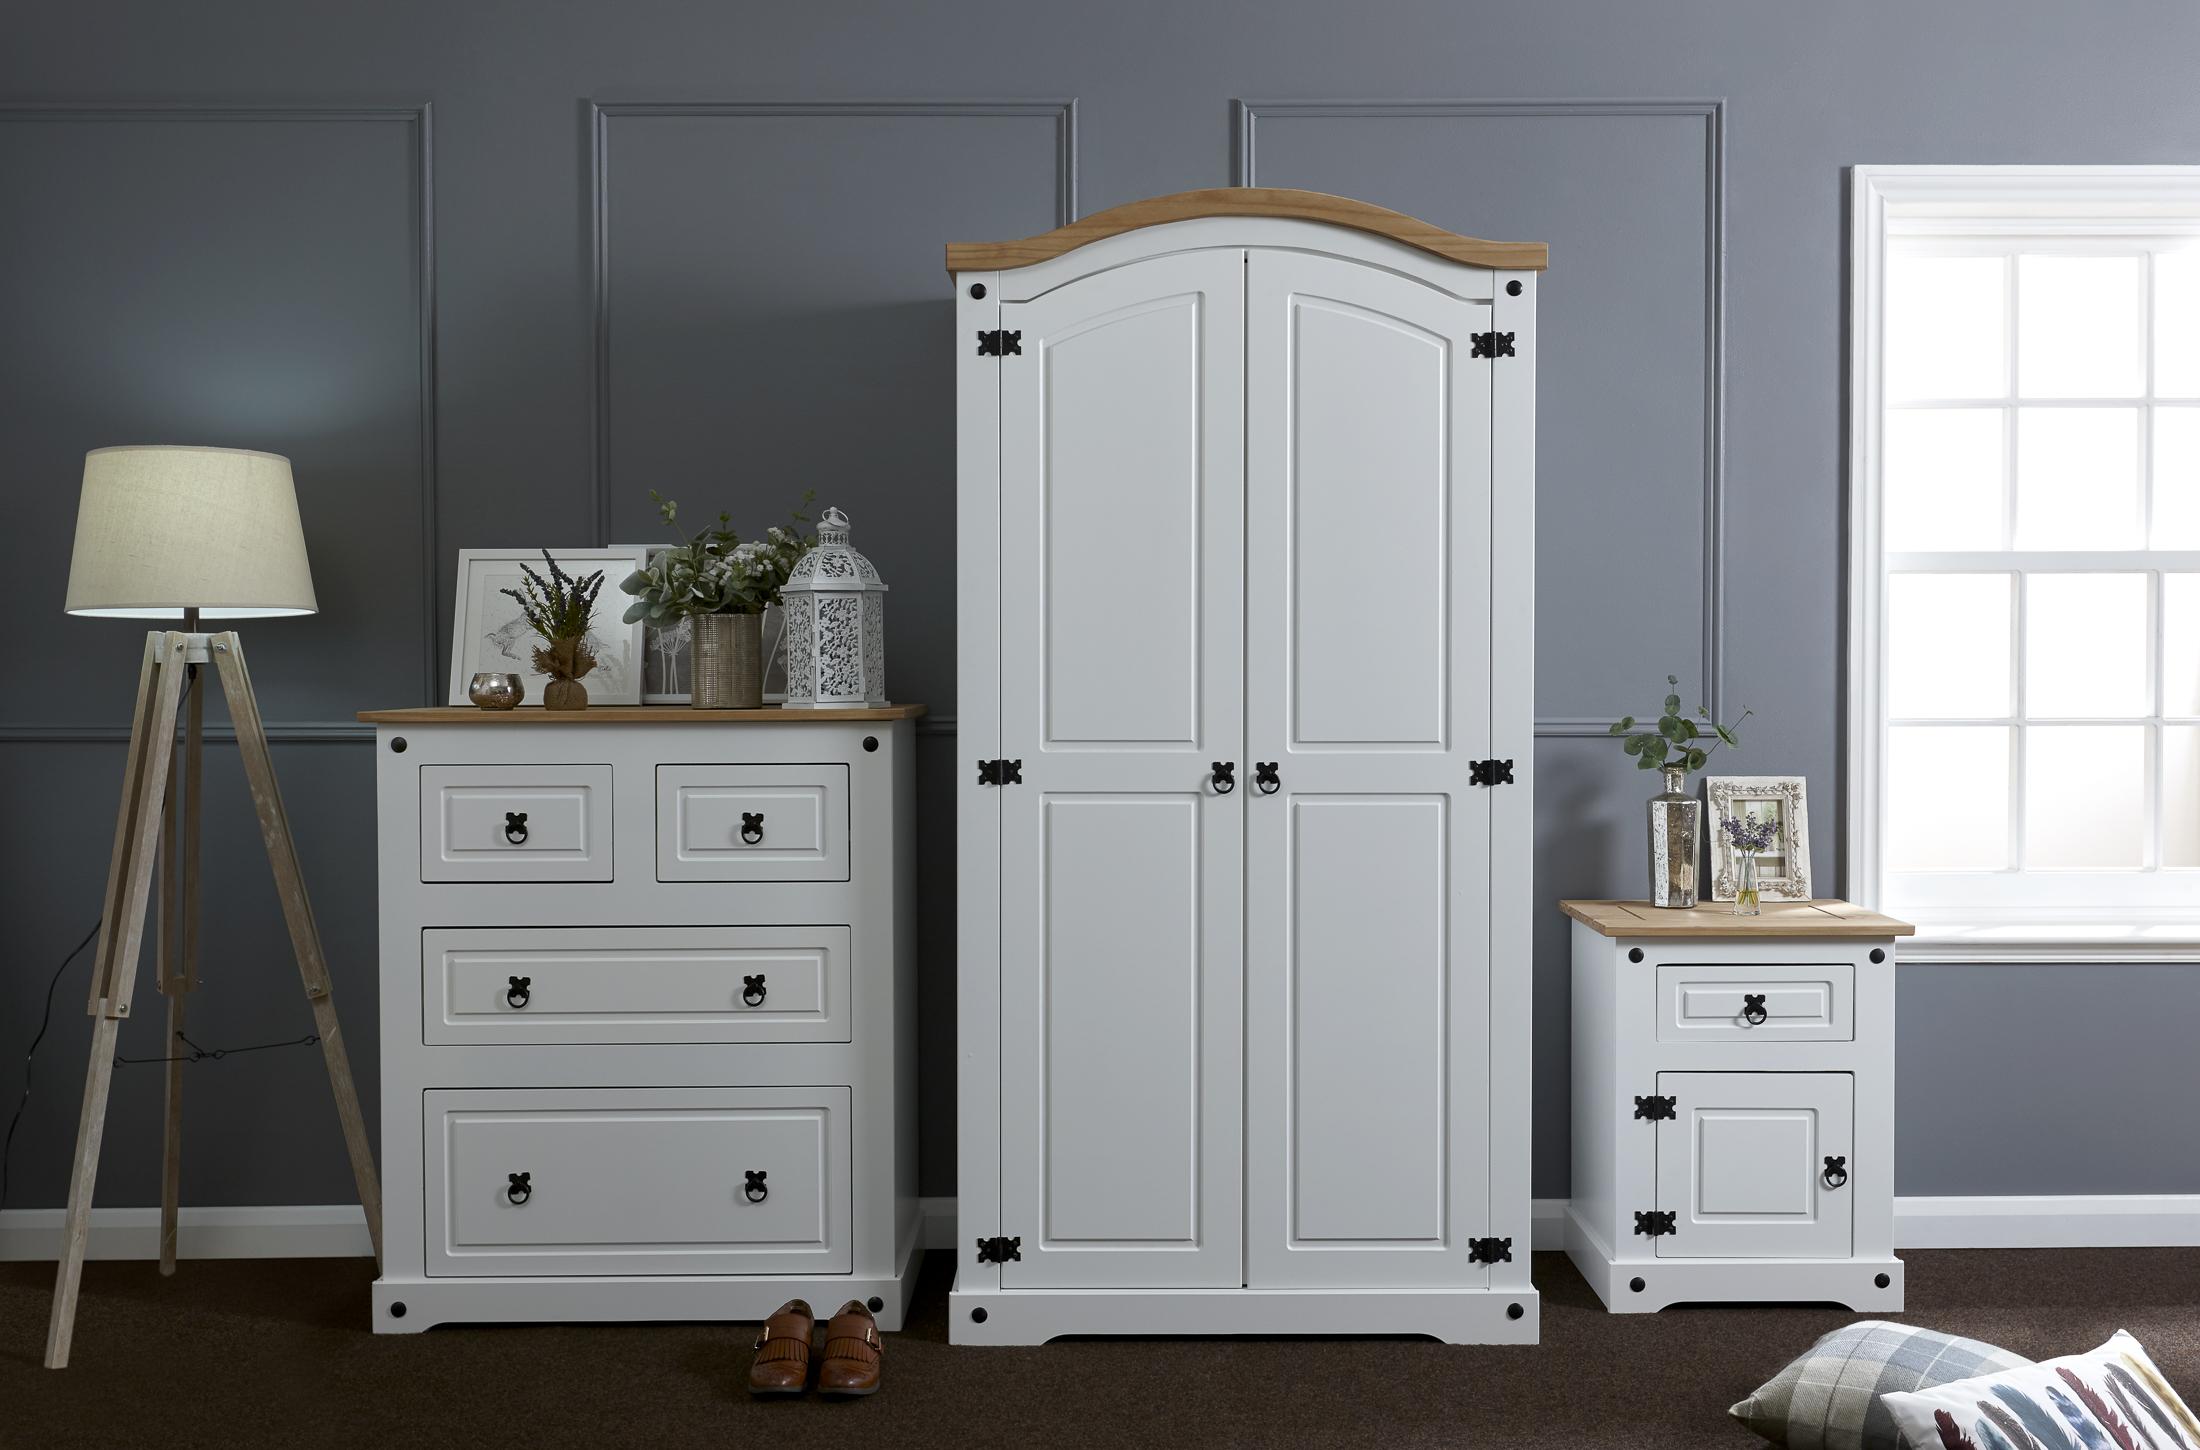 White Corona 3 Piece Trio Bedroom Furniture Set - Wardrobe, Chest ...